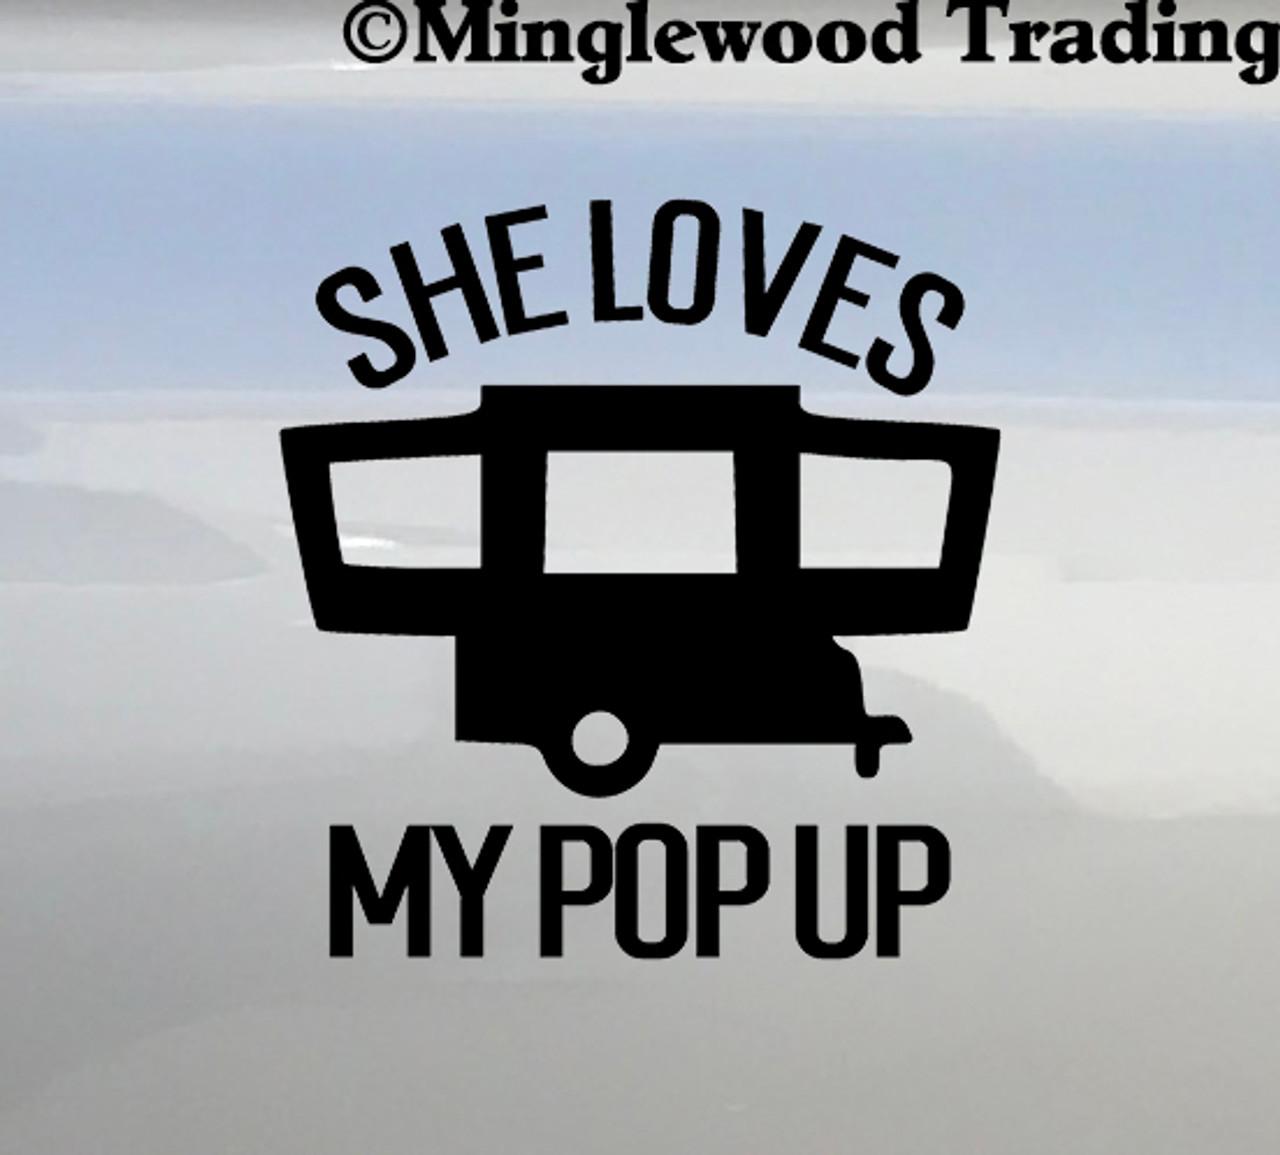 She Love My Pop Up Vinyl Sticker - Camping Trailer Hybrid Tent Folding Camper RV - Die Cut Decal